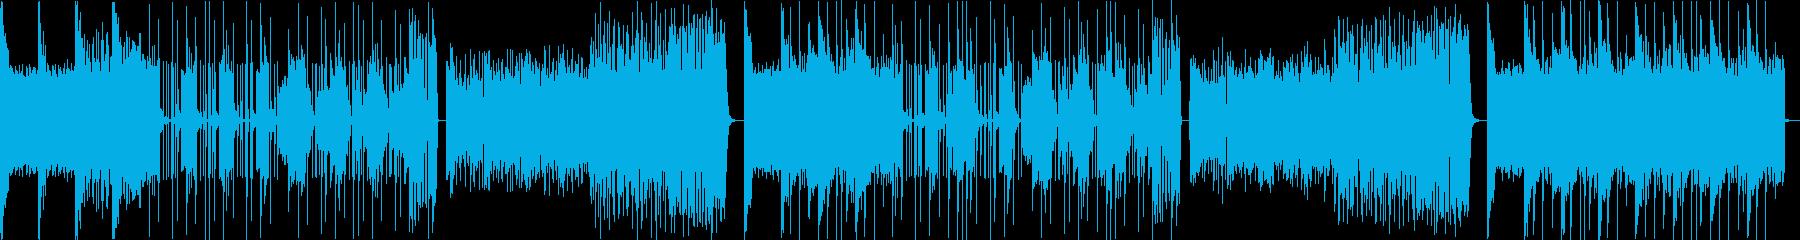 Kpop・ダークエキサイティングトラップの再生済みの波形